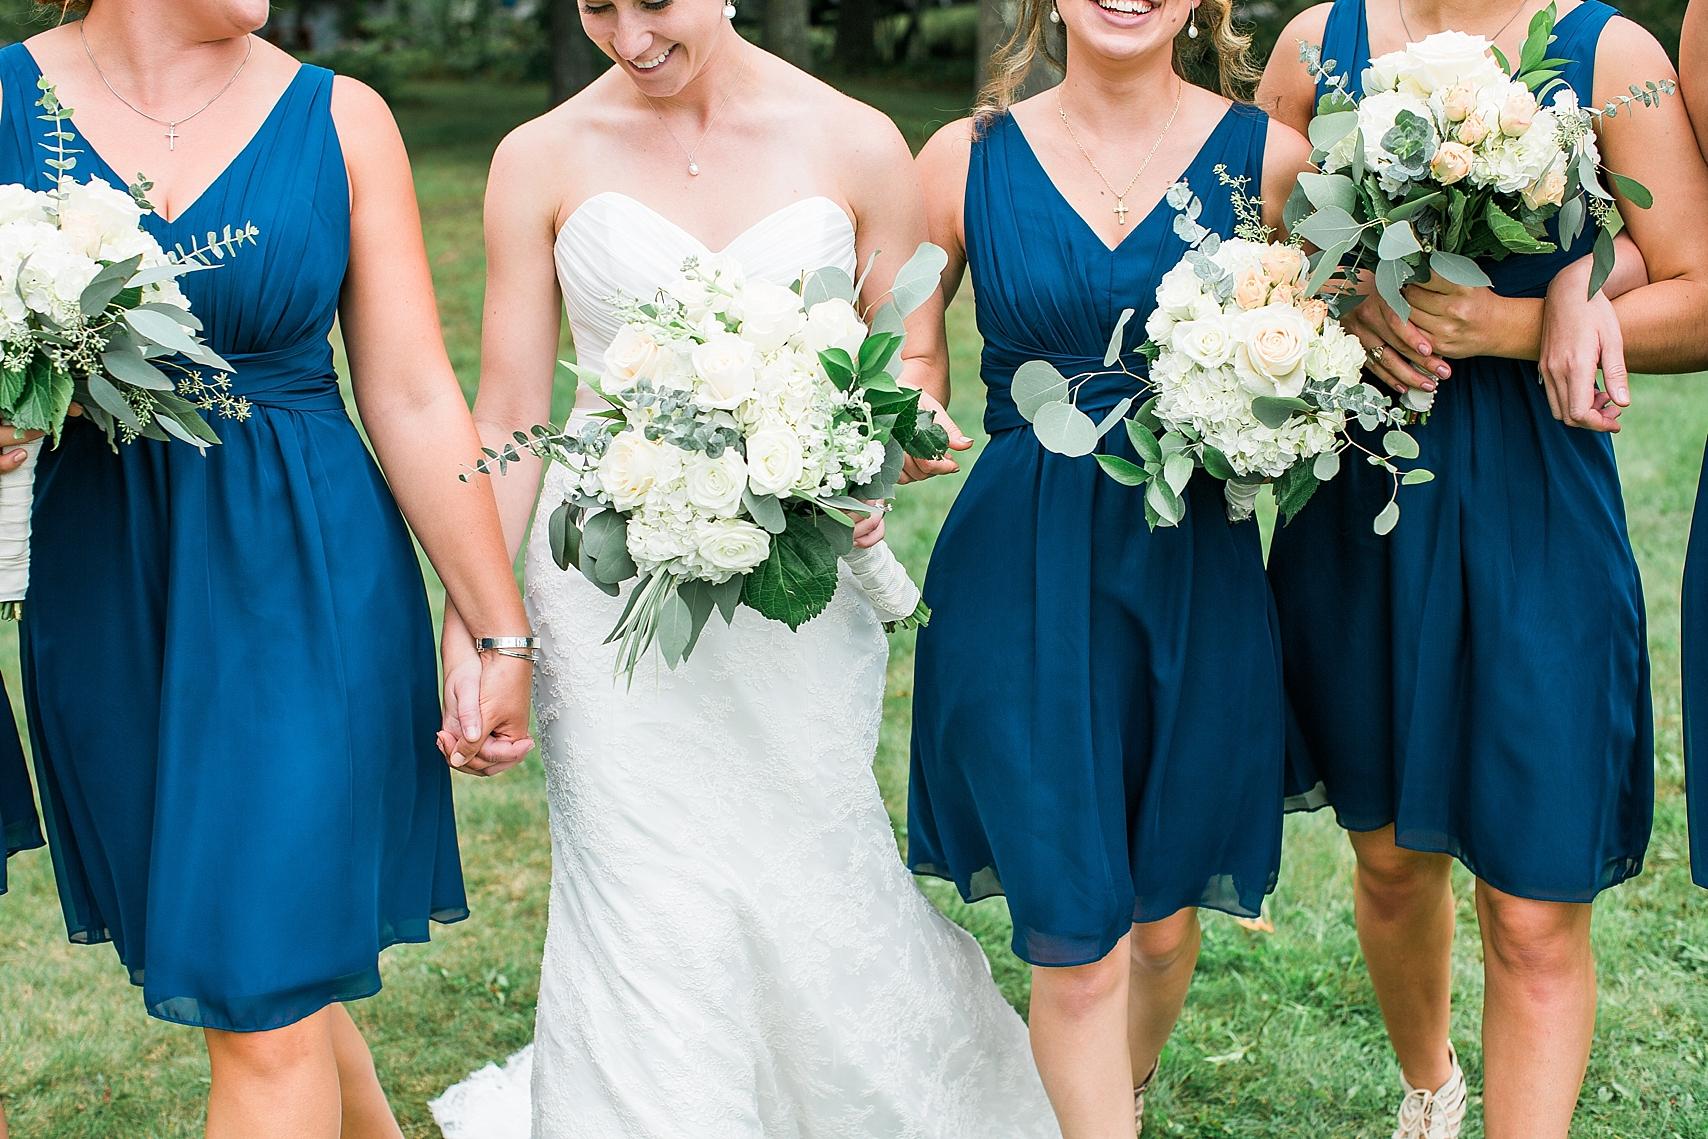 Minnesota Minneapolis Wedding Photographer Best Of 2018 Weddings Mallory Kiesow Photography_0065.jpg